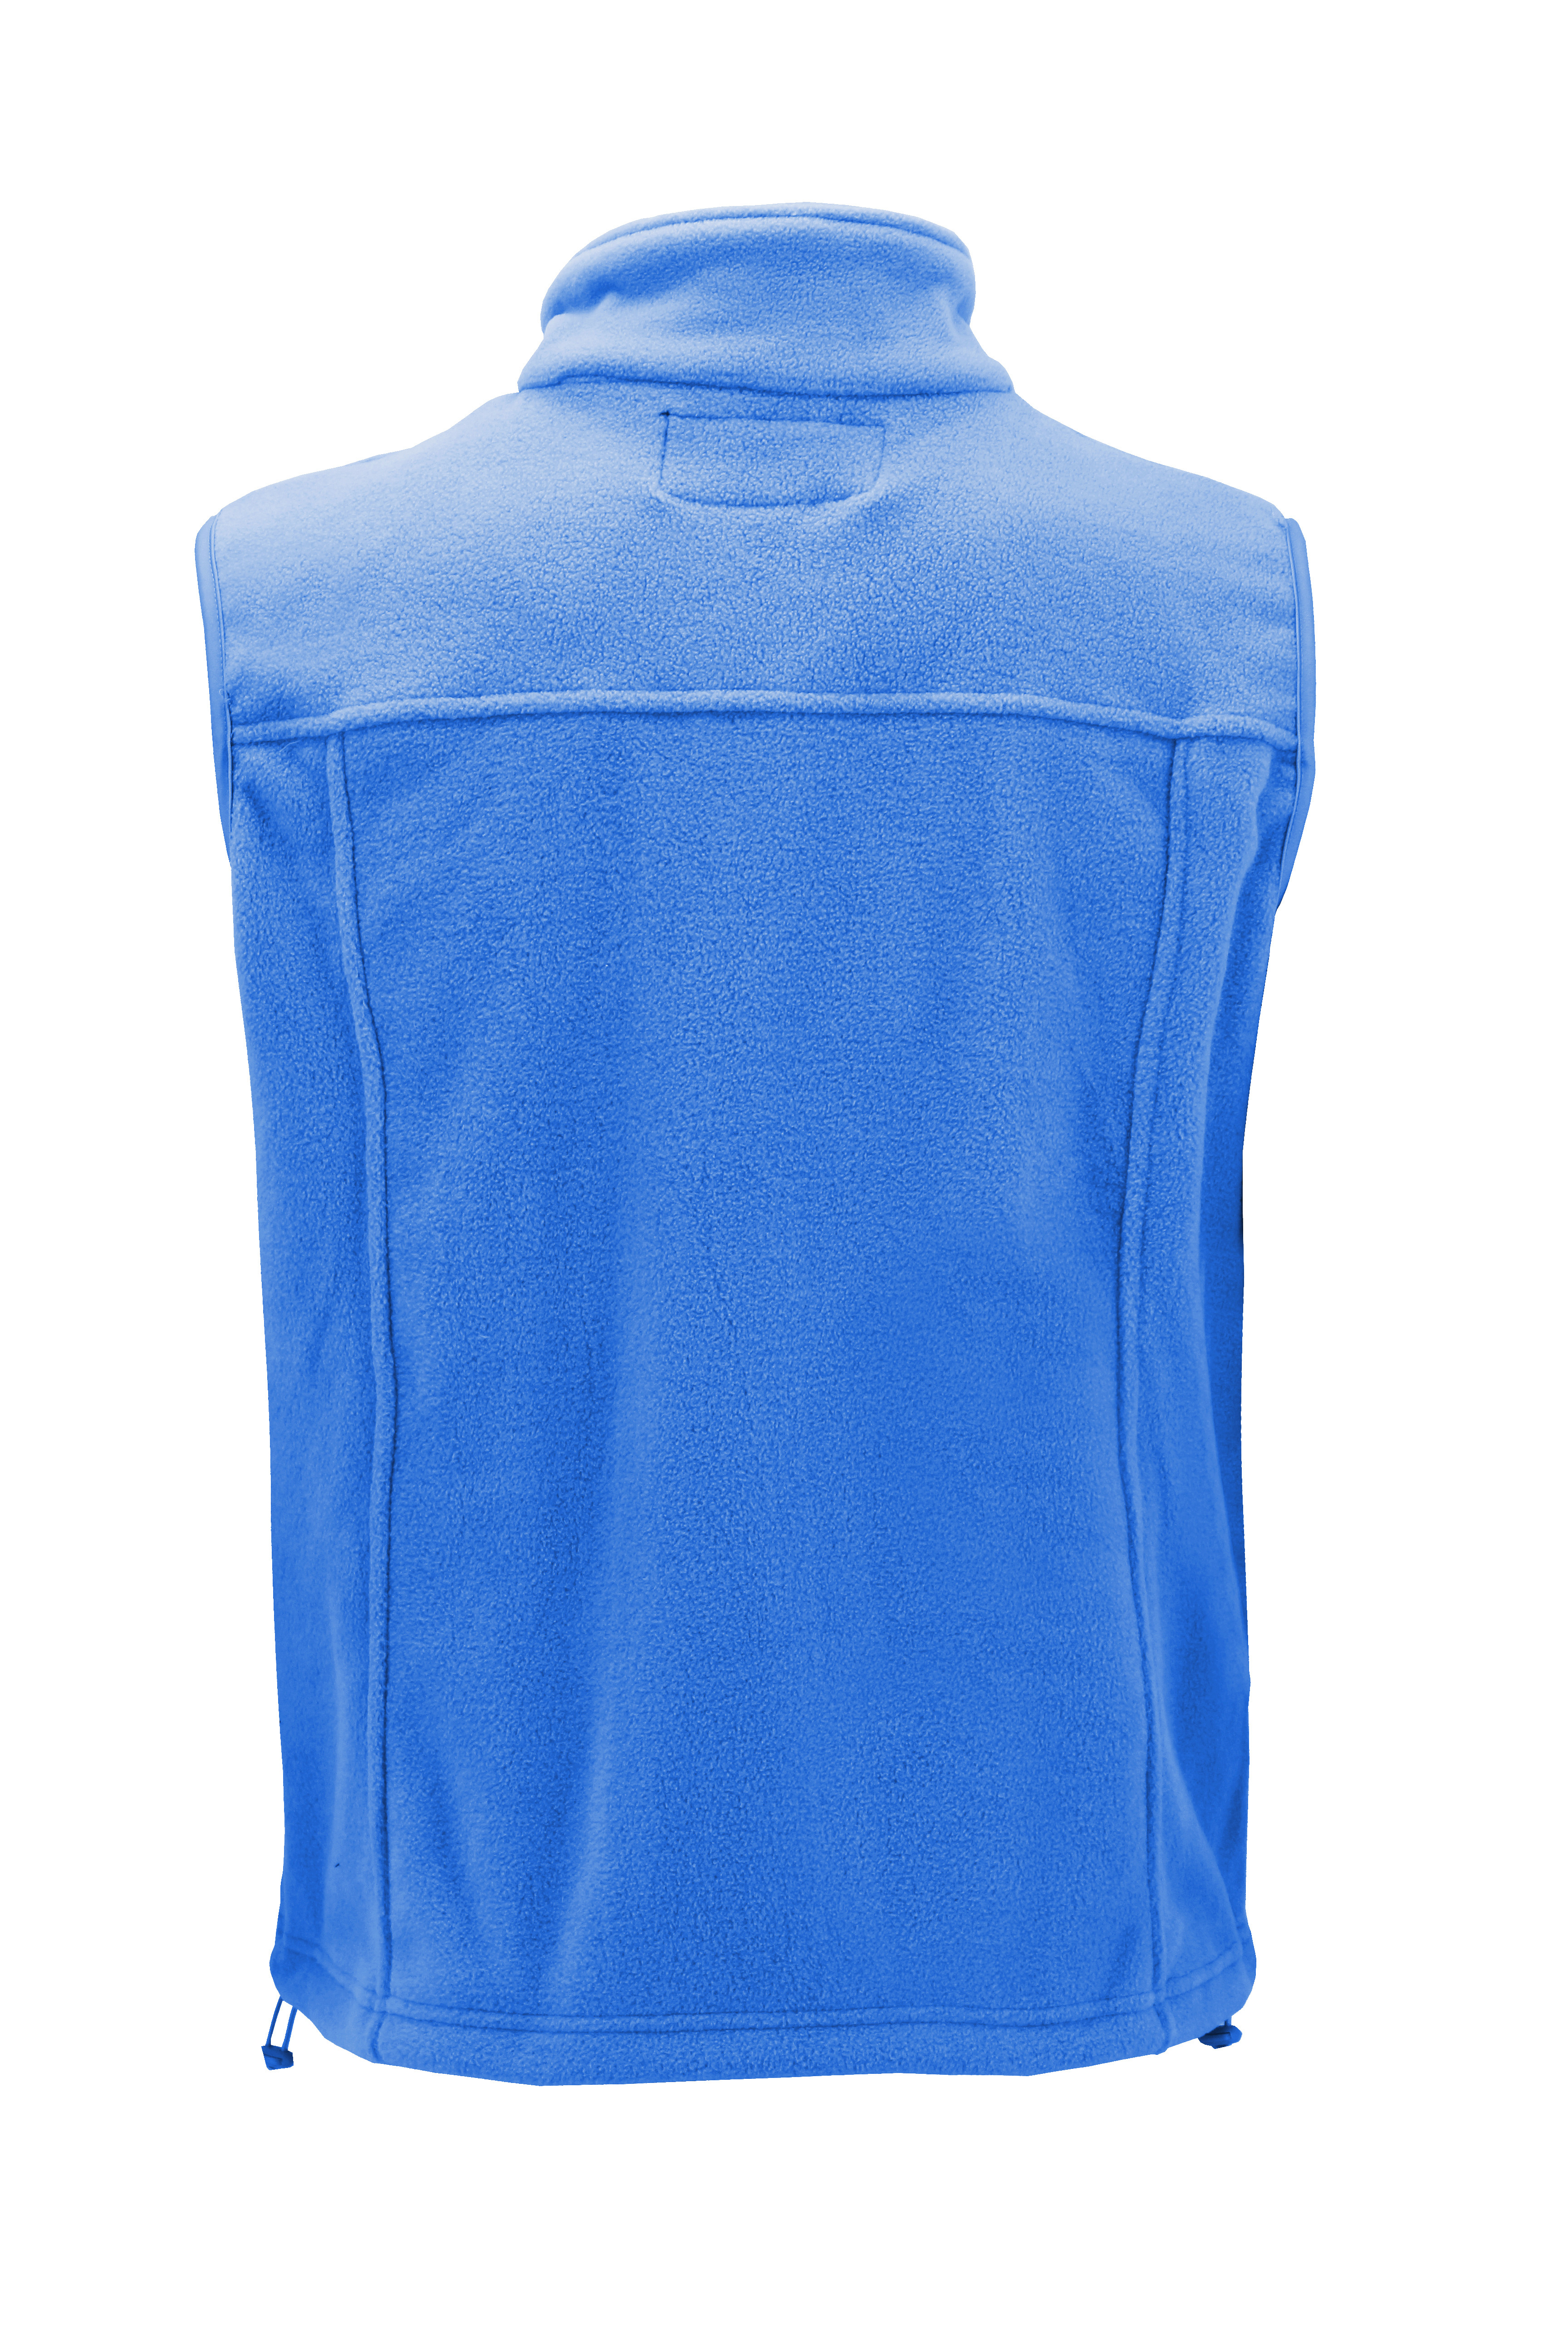 miniature 9 - Men-039-s-Polar-Fleece-Lightweight-Warm-Jacket-Collared-Full-Zip-Up-Sweater-Vest